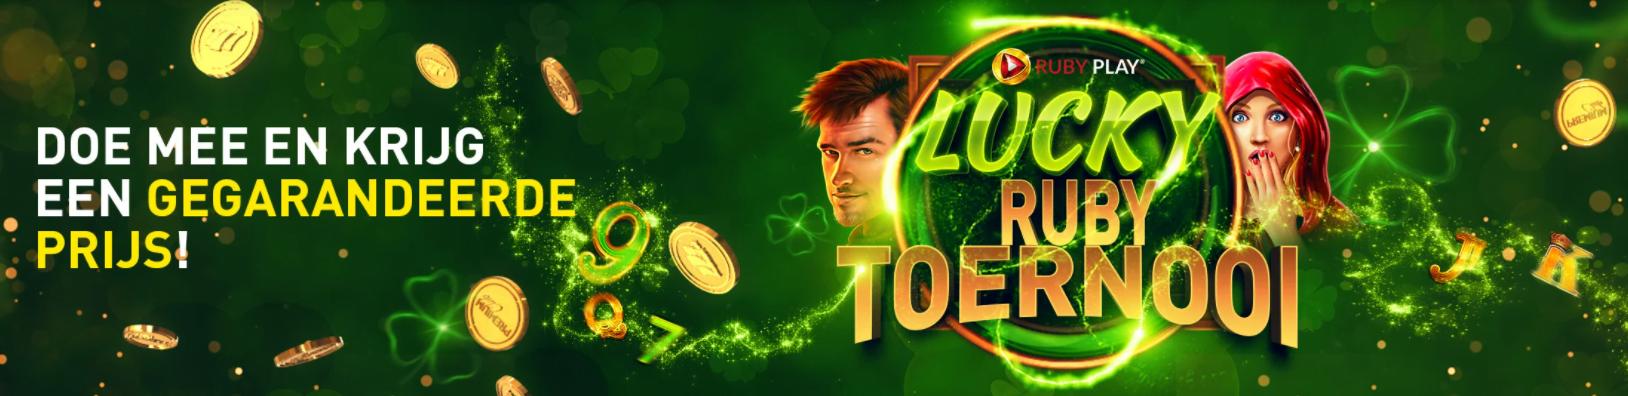 Ruby Play Lucky Ruby toernooi Casino 777 online speelhal Jackpot gegarandeerde Prijzenpot videoslots gokkast 2021